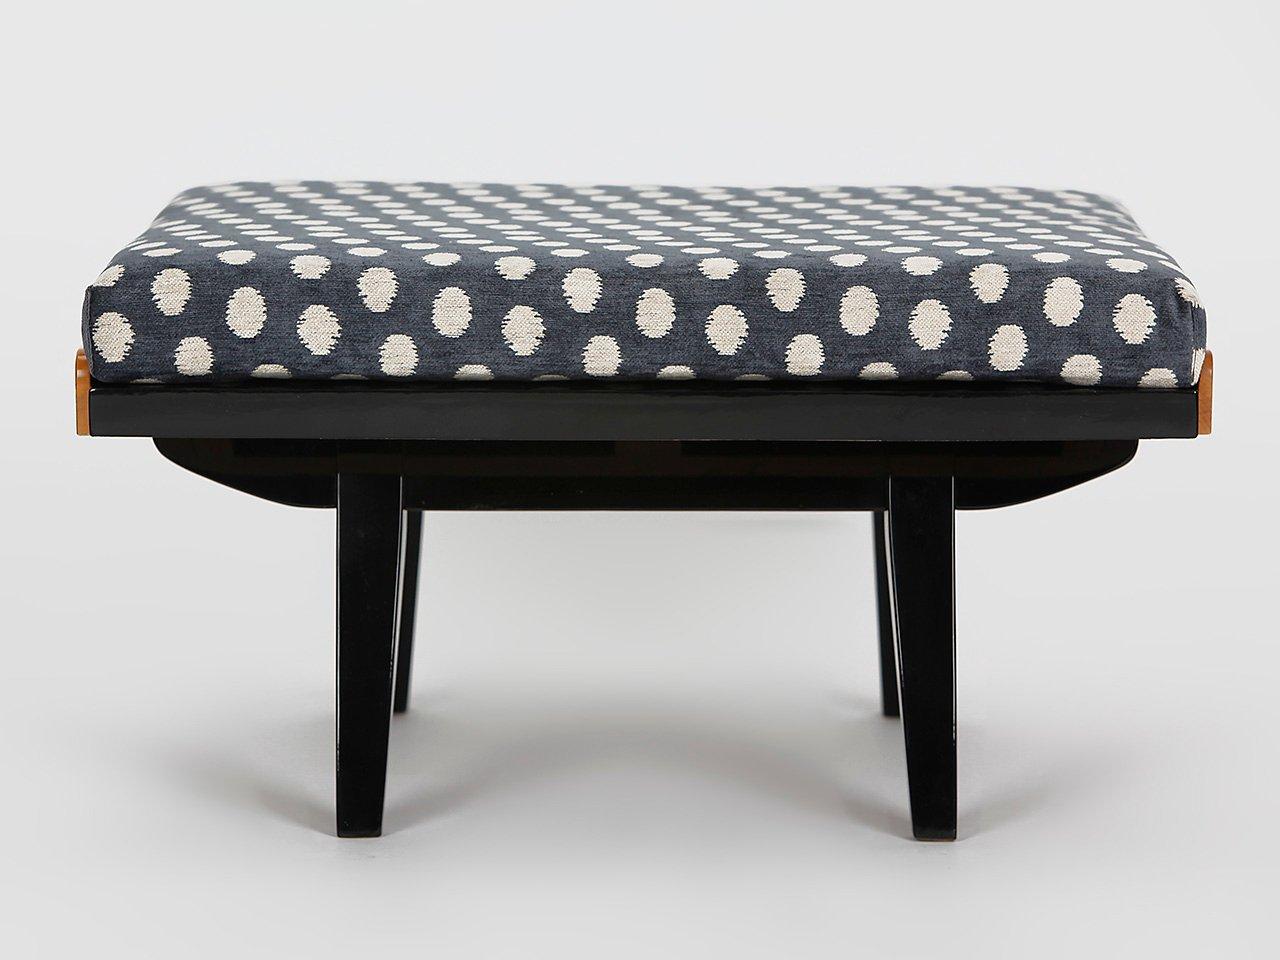 table basse ou repose pied de tatra 1960s en vente sur pamono. Black Bedroom Furniture Sets. Home Design Ideas